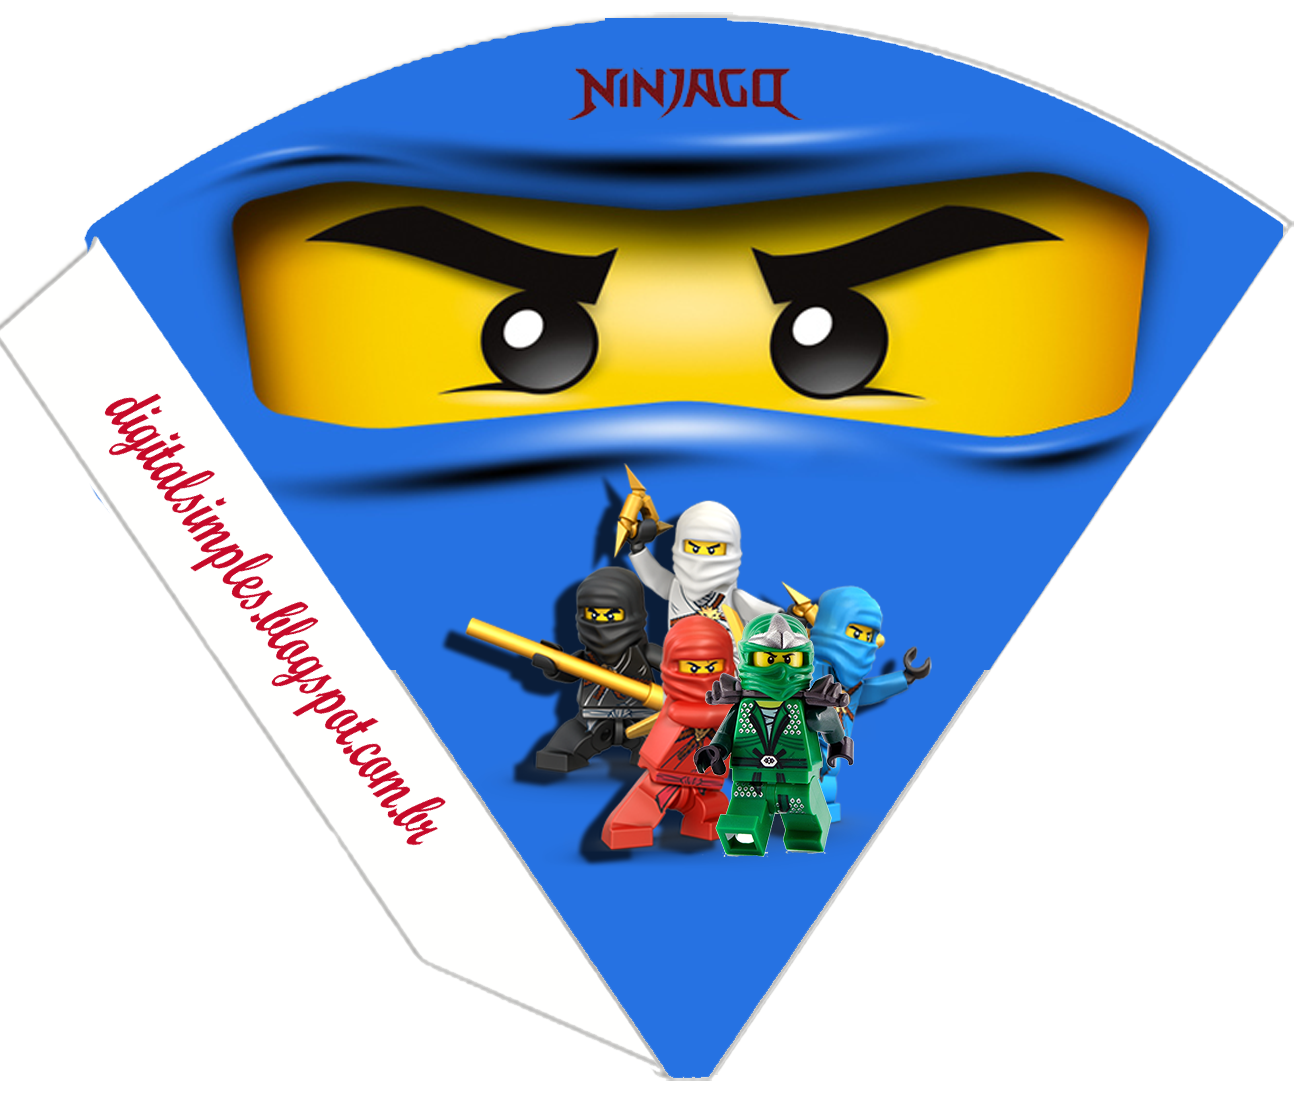 Kit Digital Aniversario Ninjago Para Imprimir